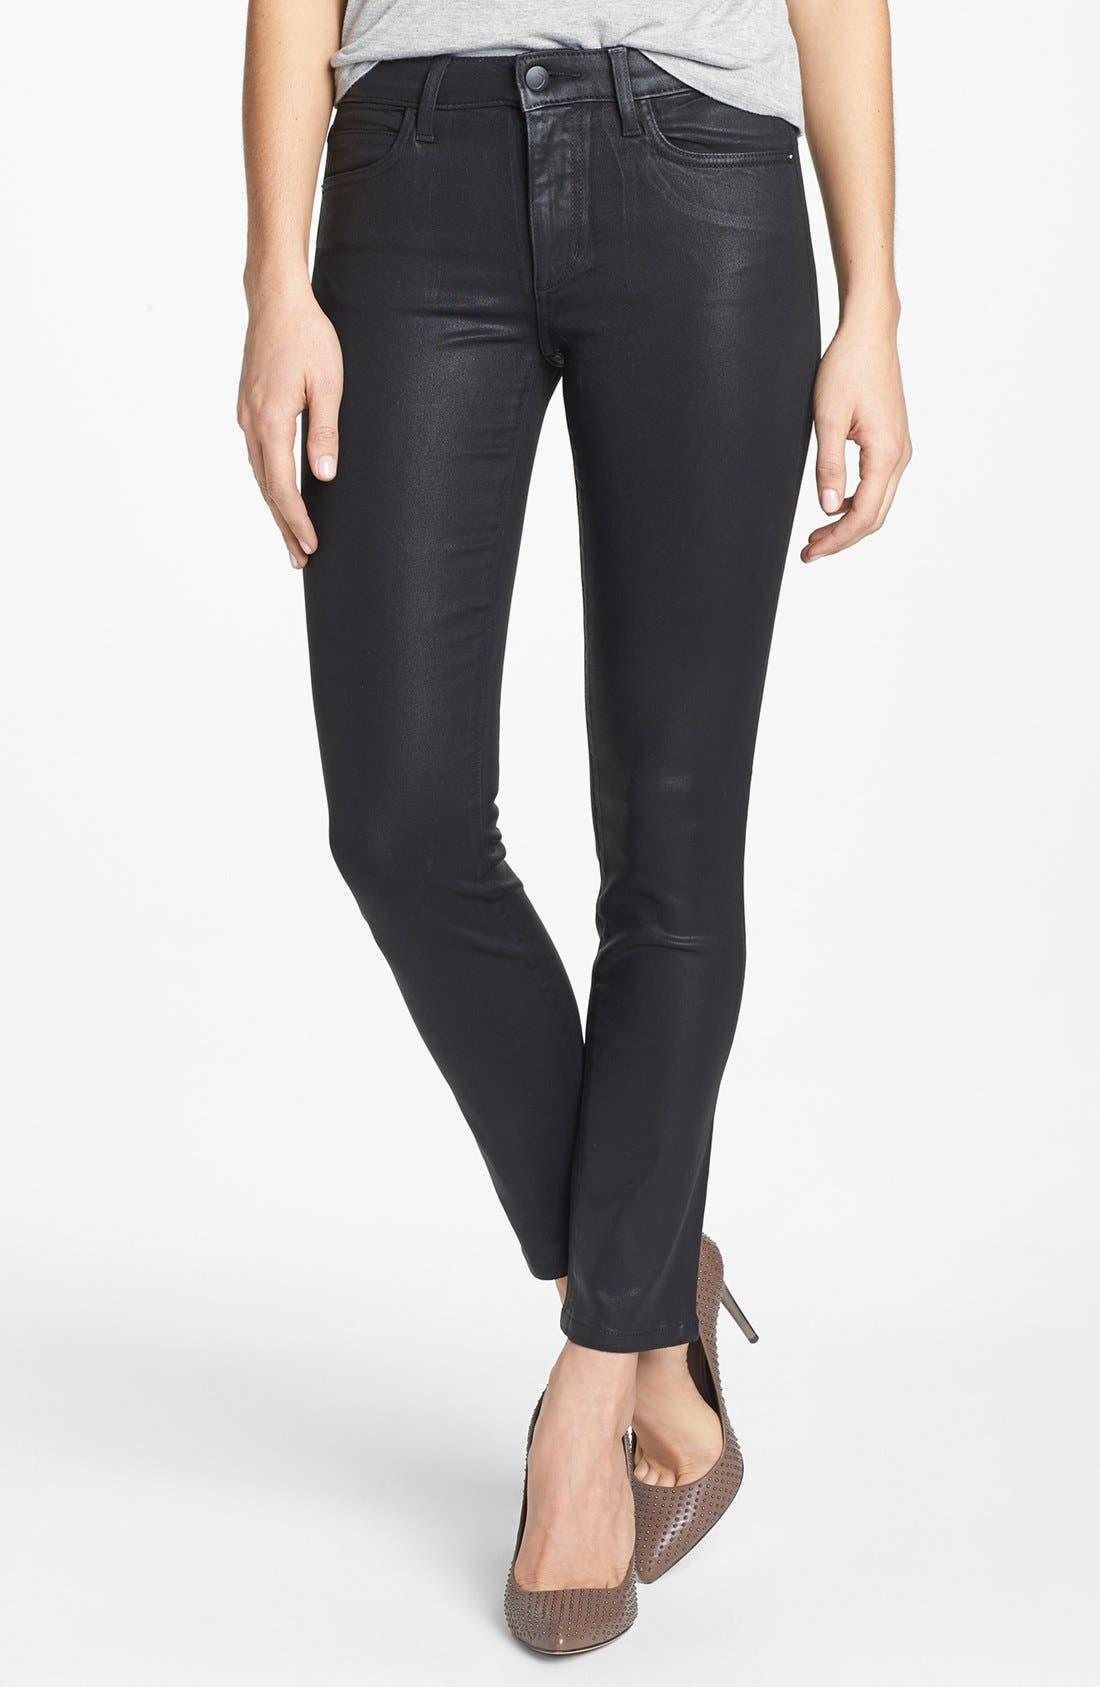 Main Image - Joe's Coated Skinny Ankle Jeans (Jet Black)